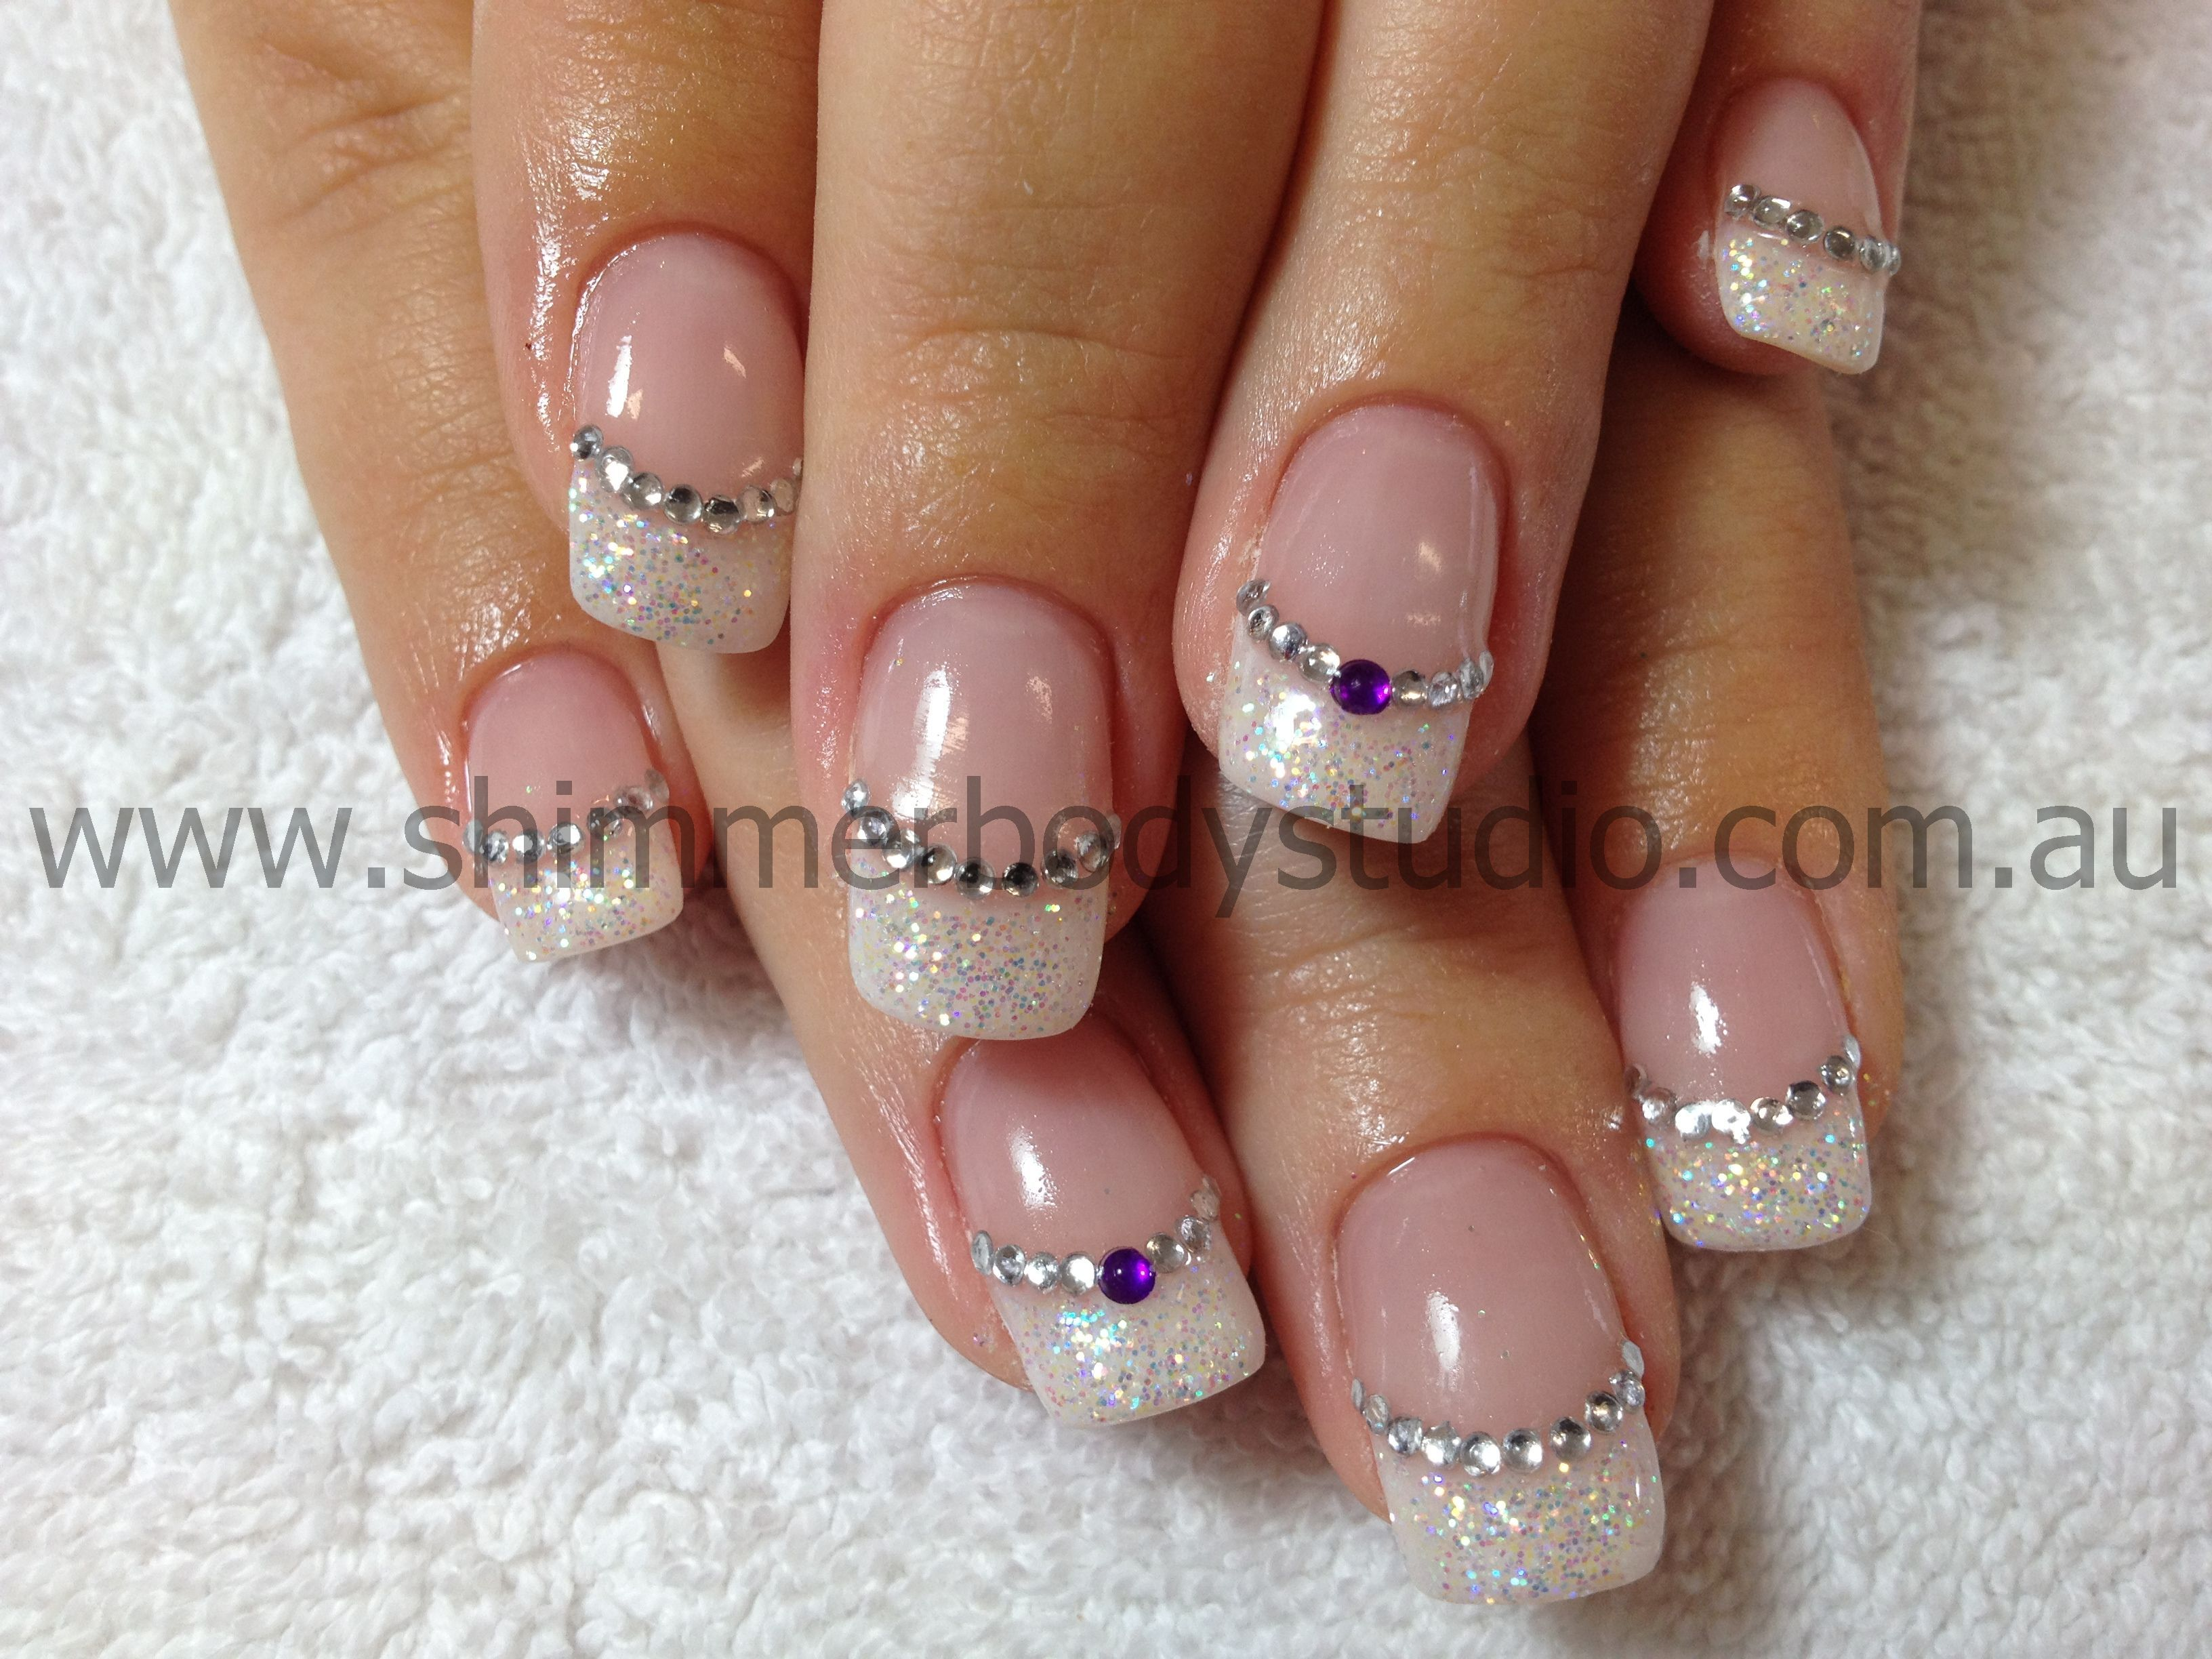 Gel Nails. French Nails. Glitter Nail Art.   Nailart   Pinterest ...